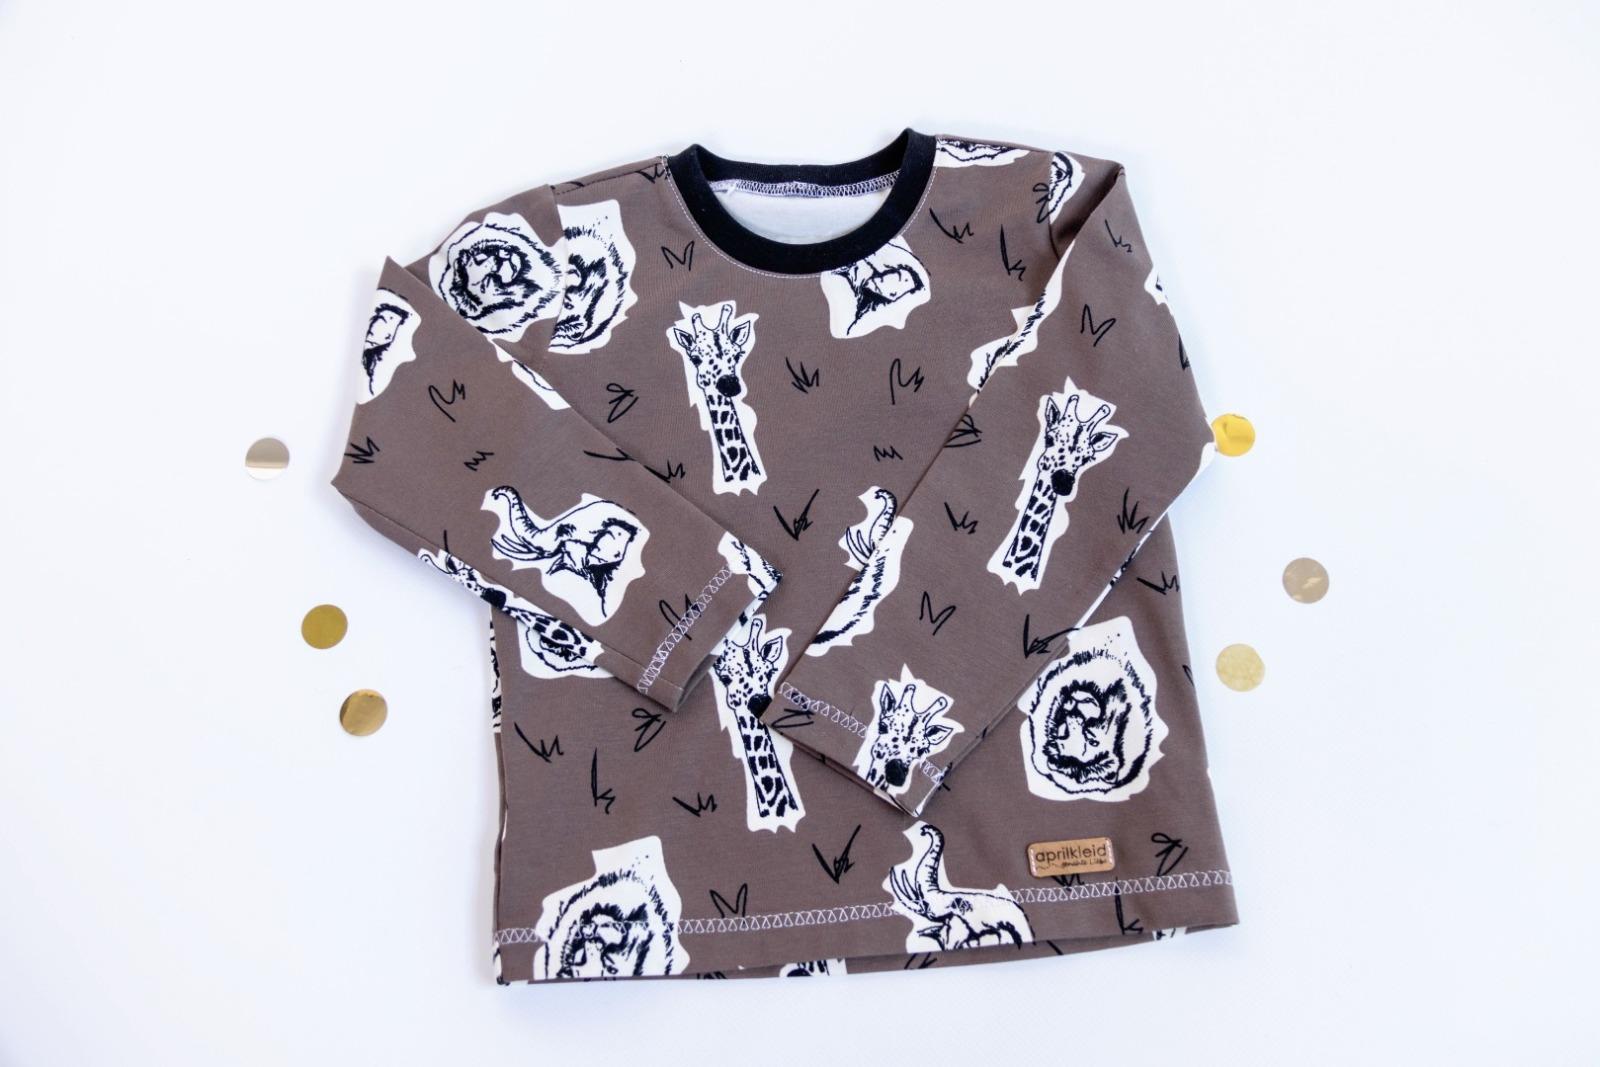 Sofortkauf Handmade Sweatshirt Gr 92